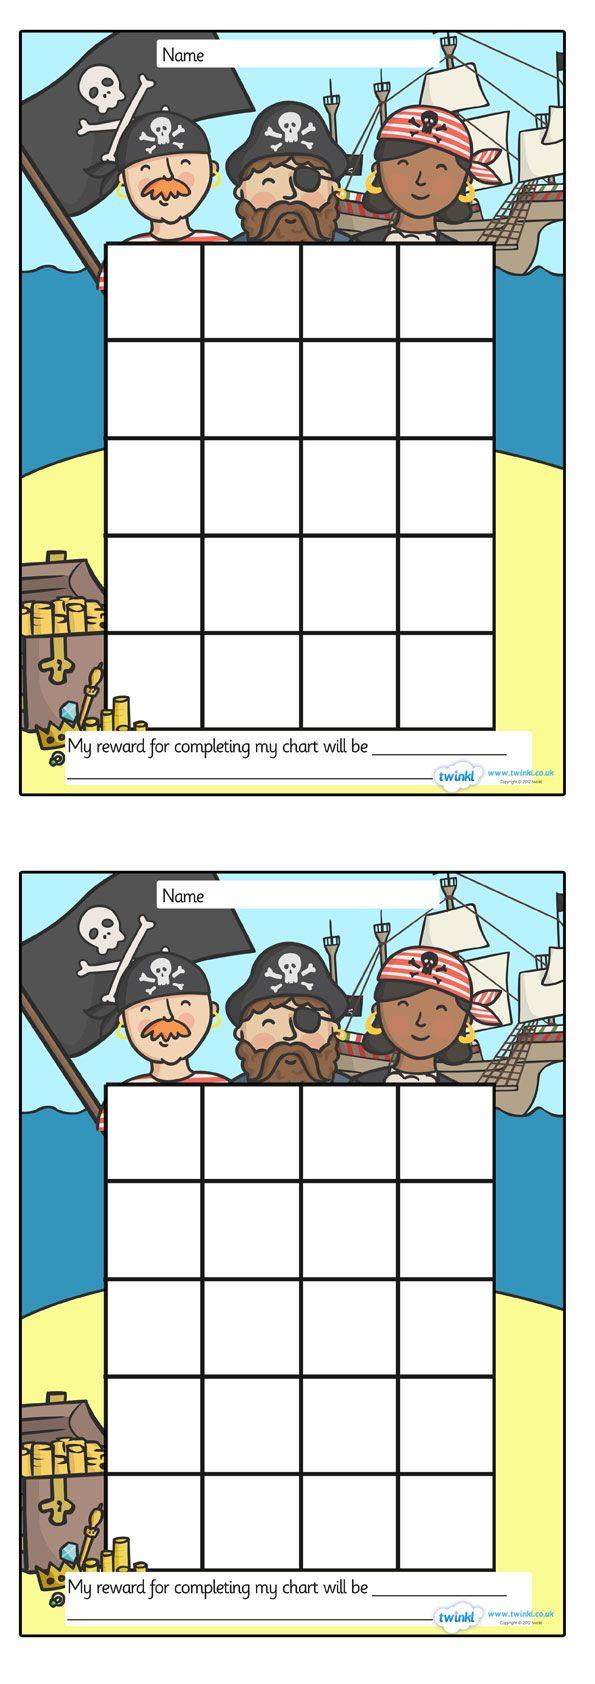 Twinkl Resources >> Pirate Sticker/Stamp Reward Chart  >> Classroom printables for Pre-School, Kindergarten, Elementary School and beyond! Rewards, Sticker Charts, Class Management, Behavior